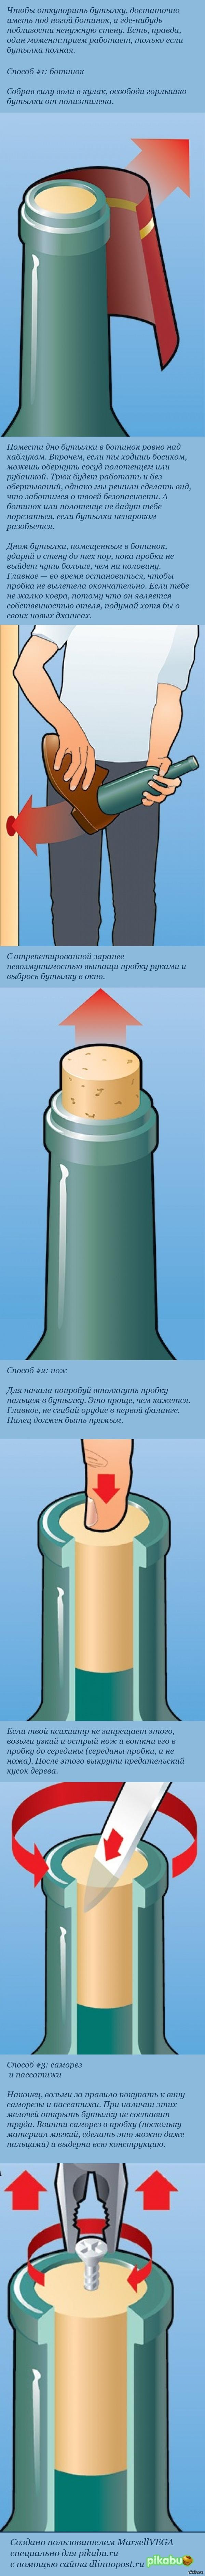 открыть вино без штопора вдруг кому-то поможет!